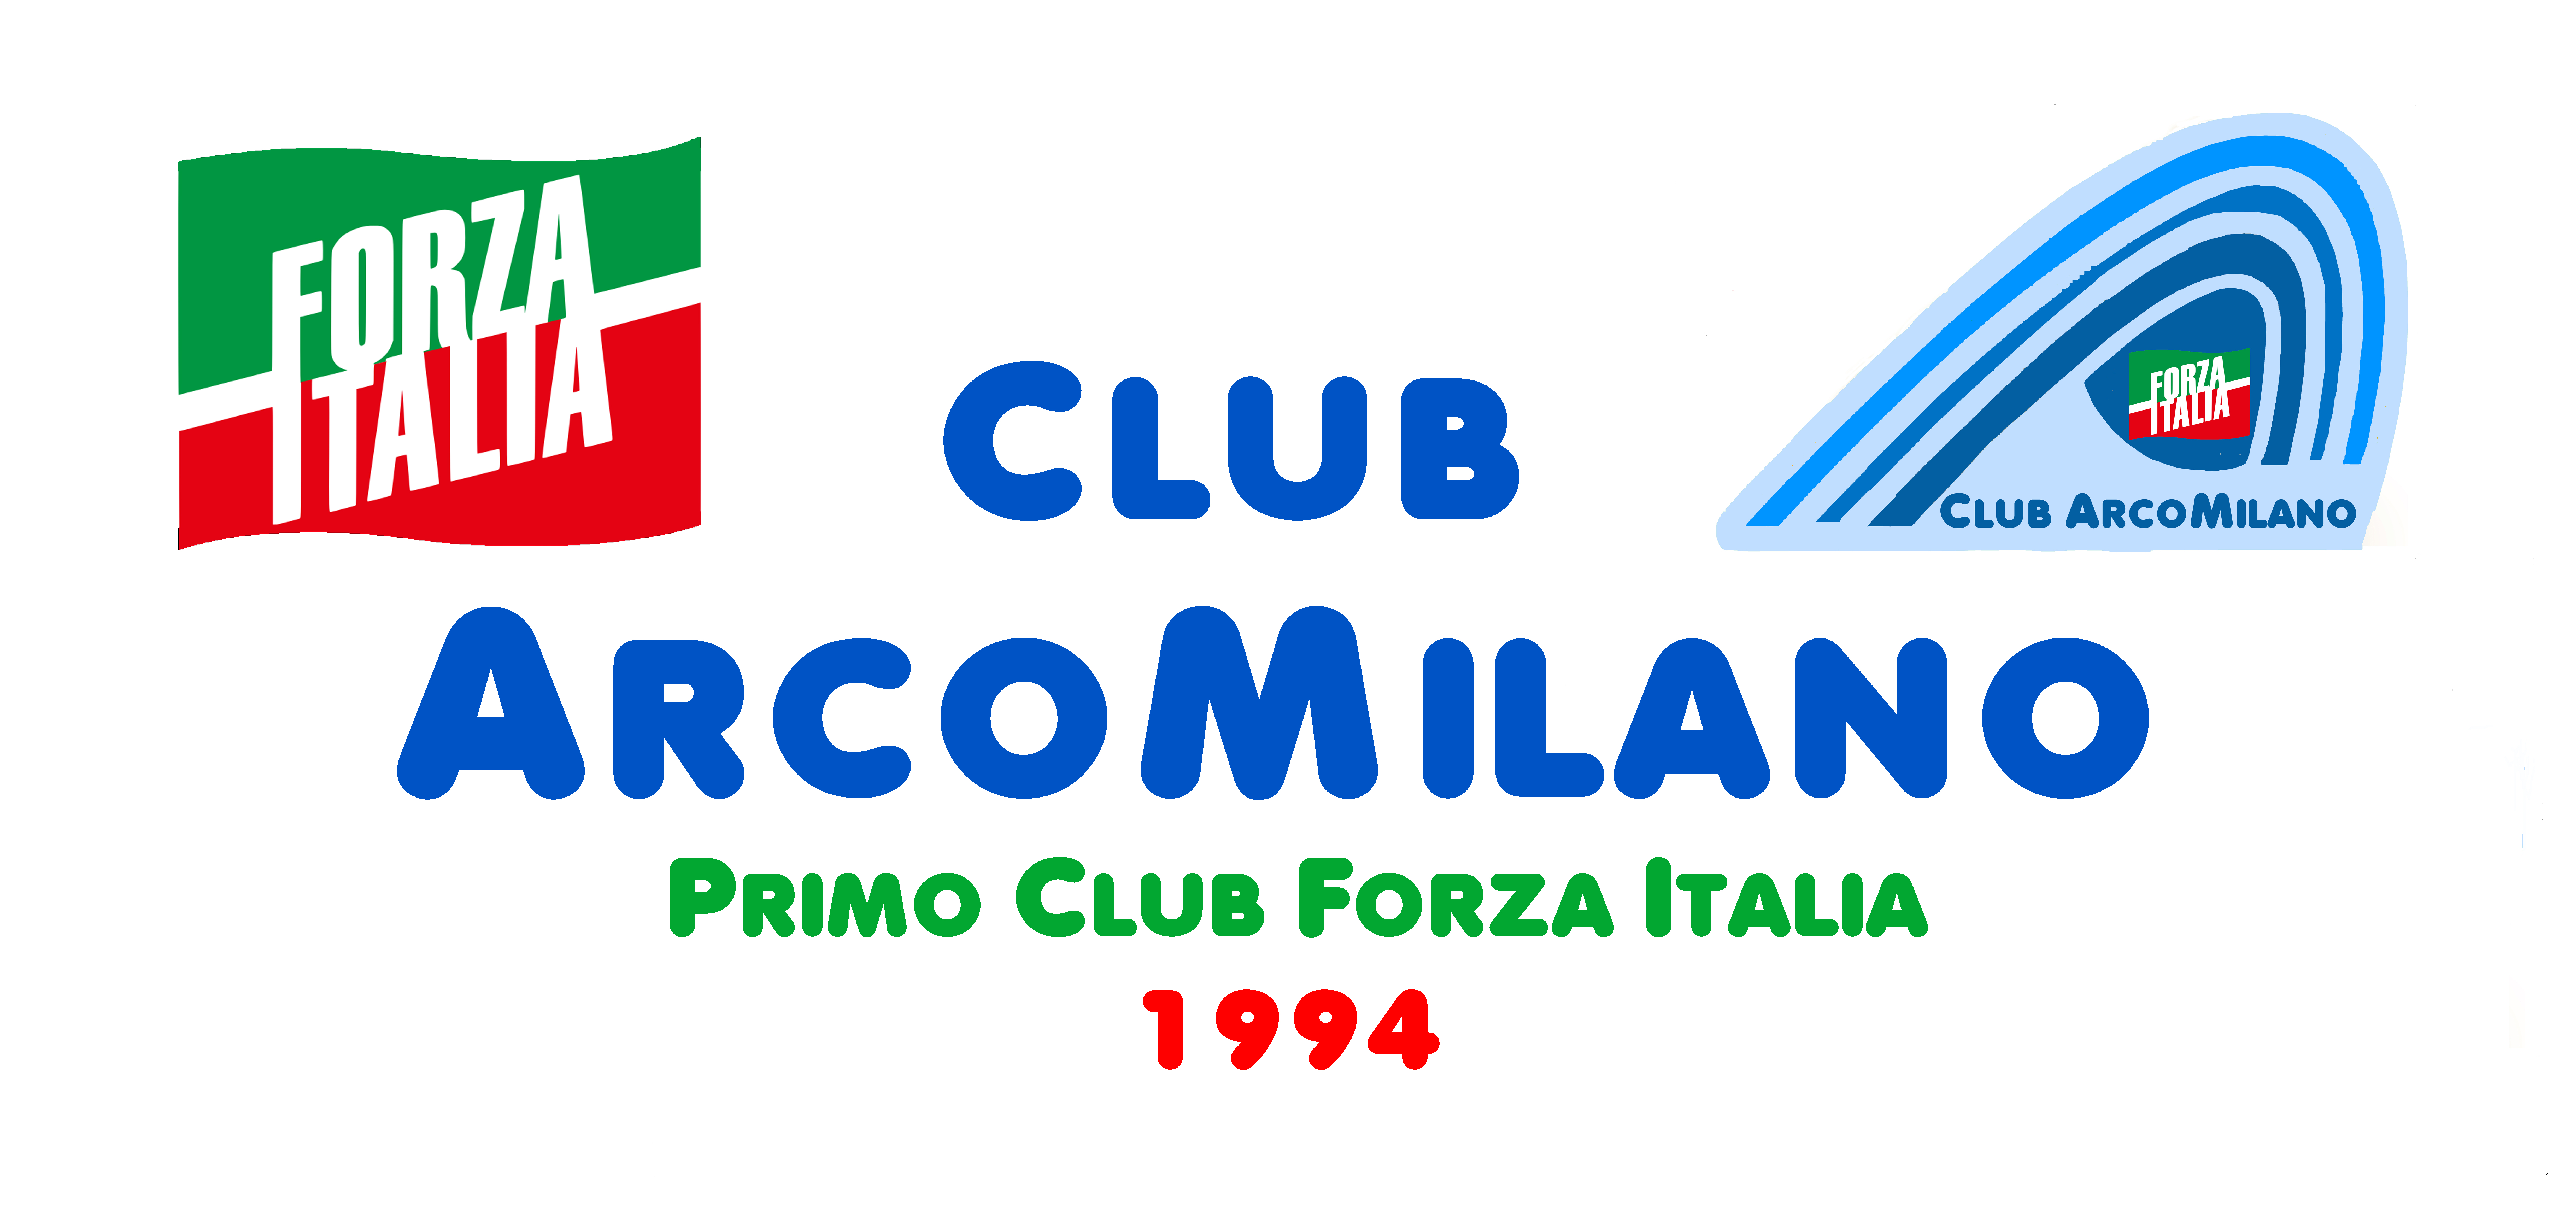 Club Arcobaleno Milano